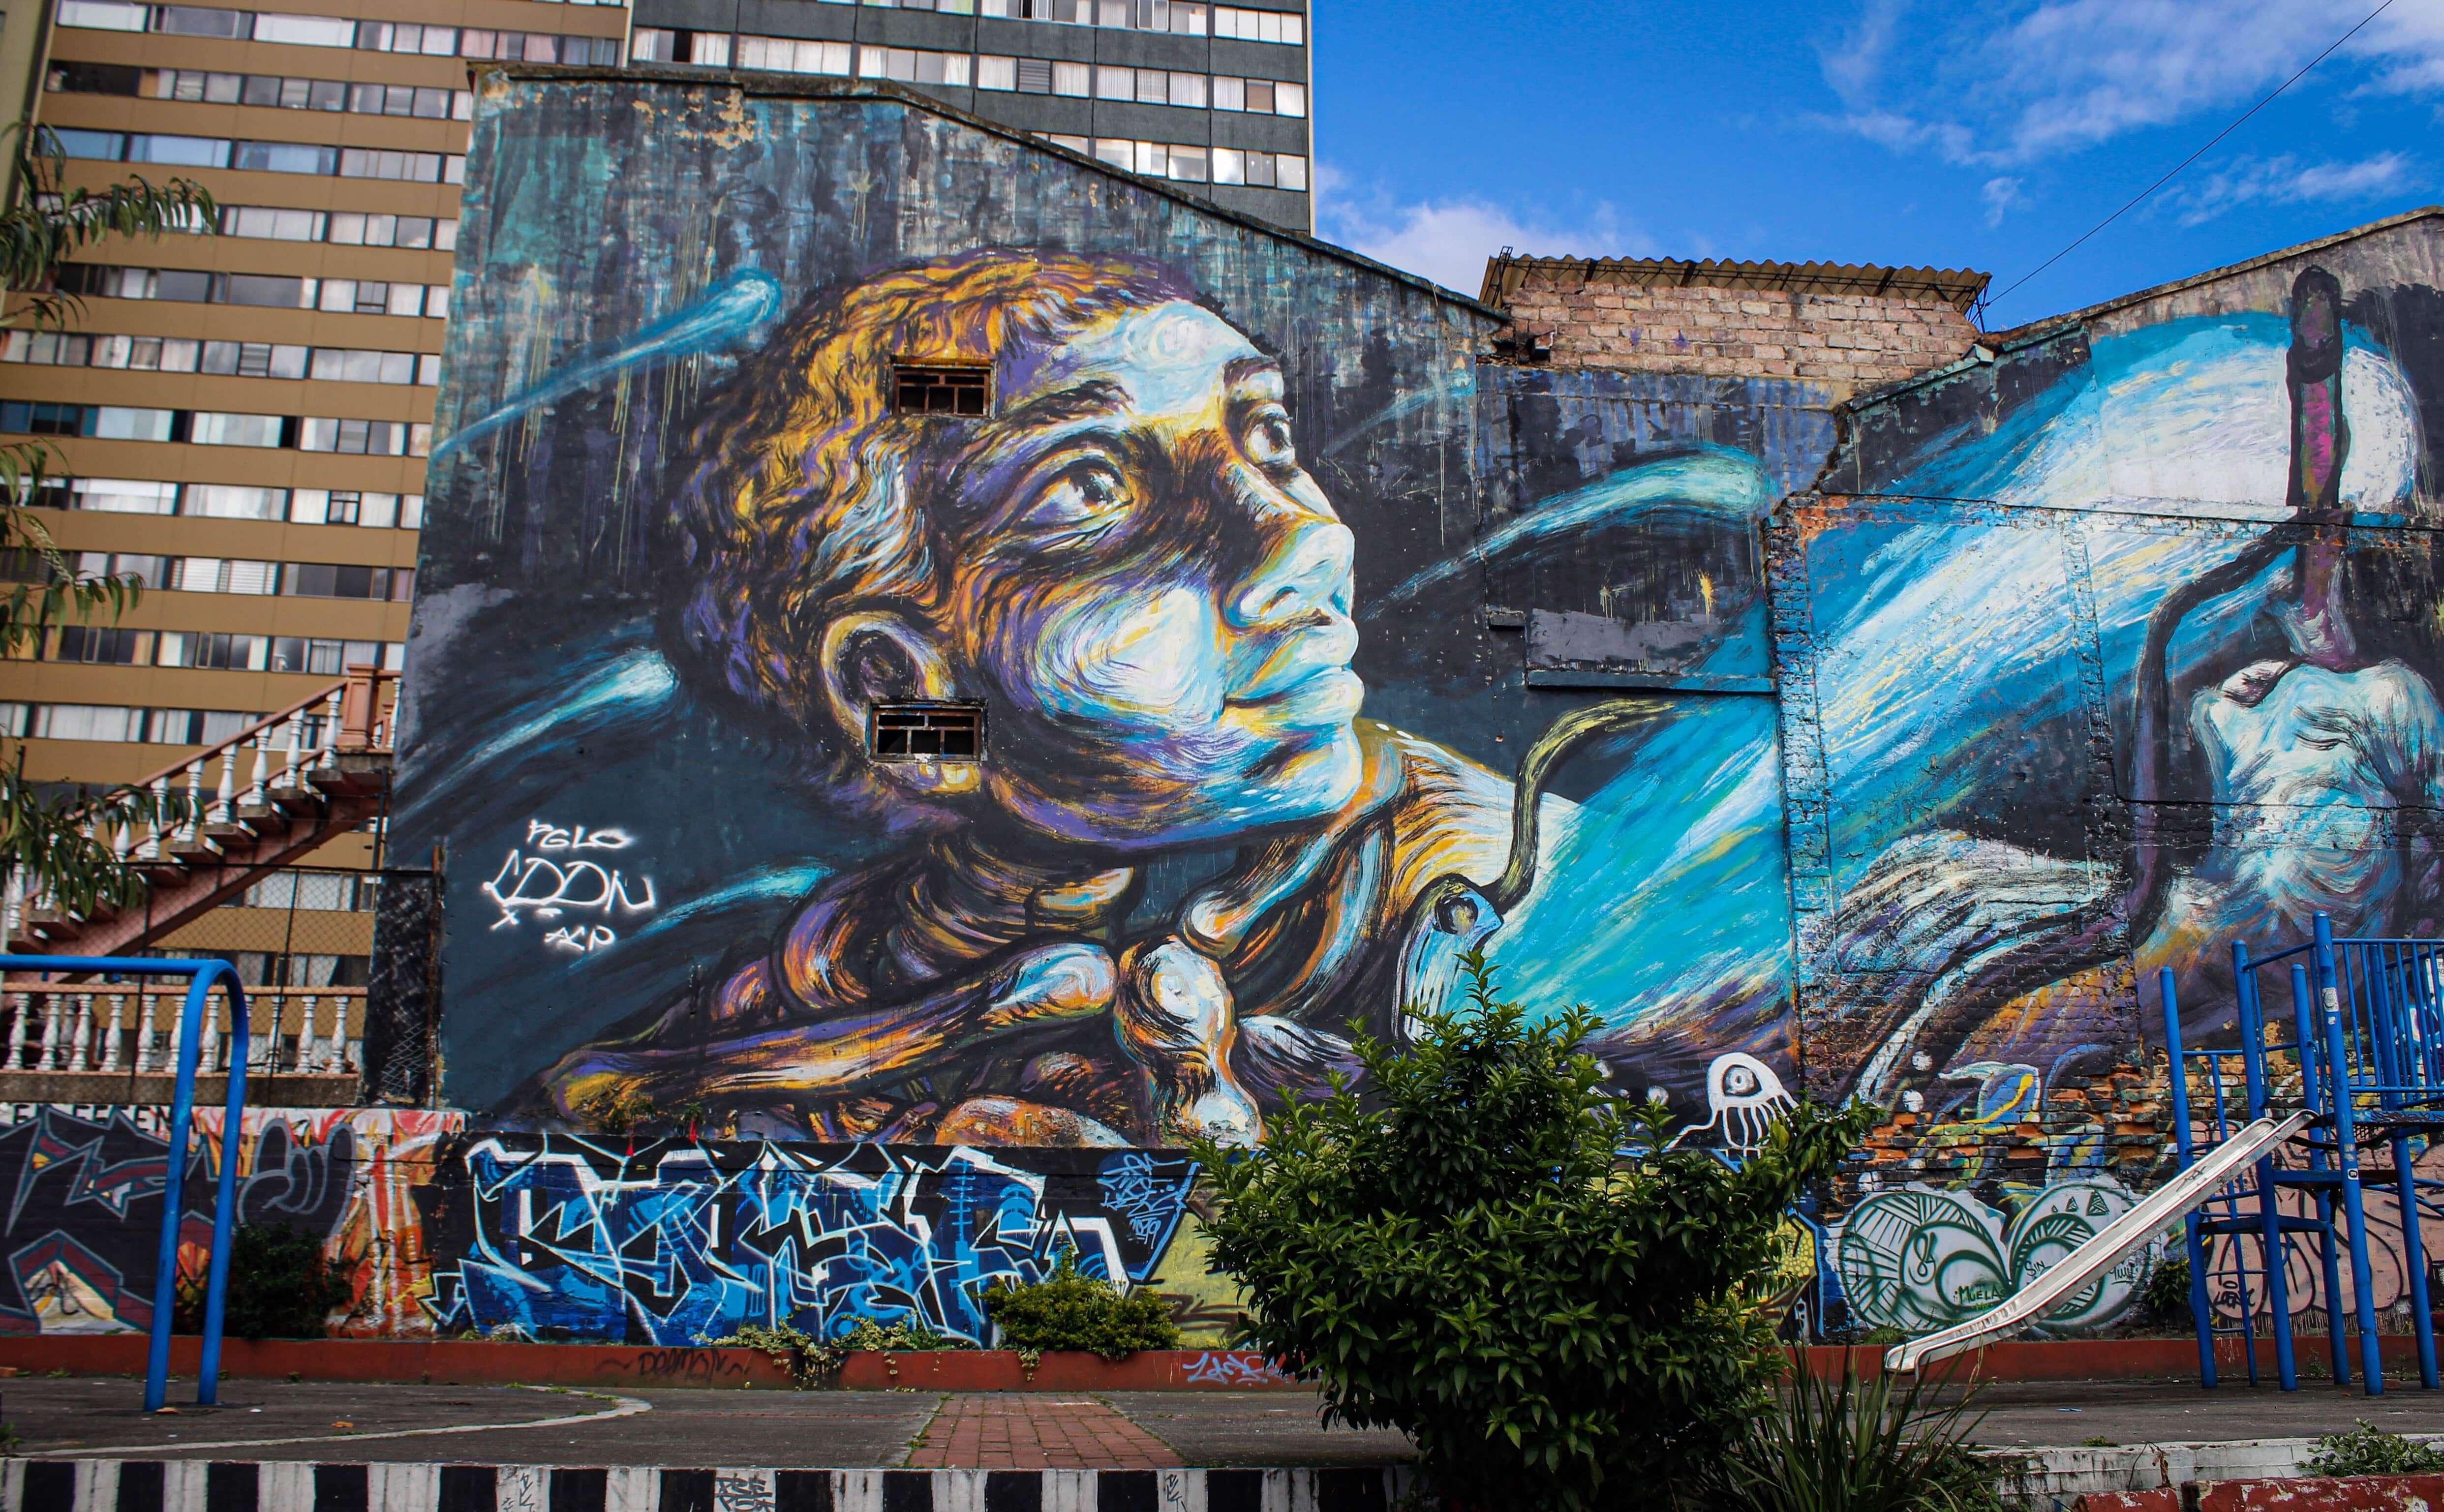 bogota graffiti tour bogota travel guide